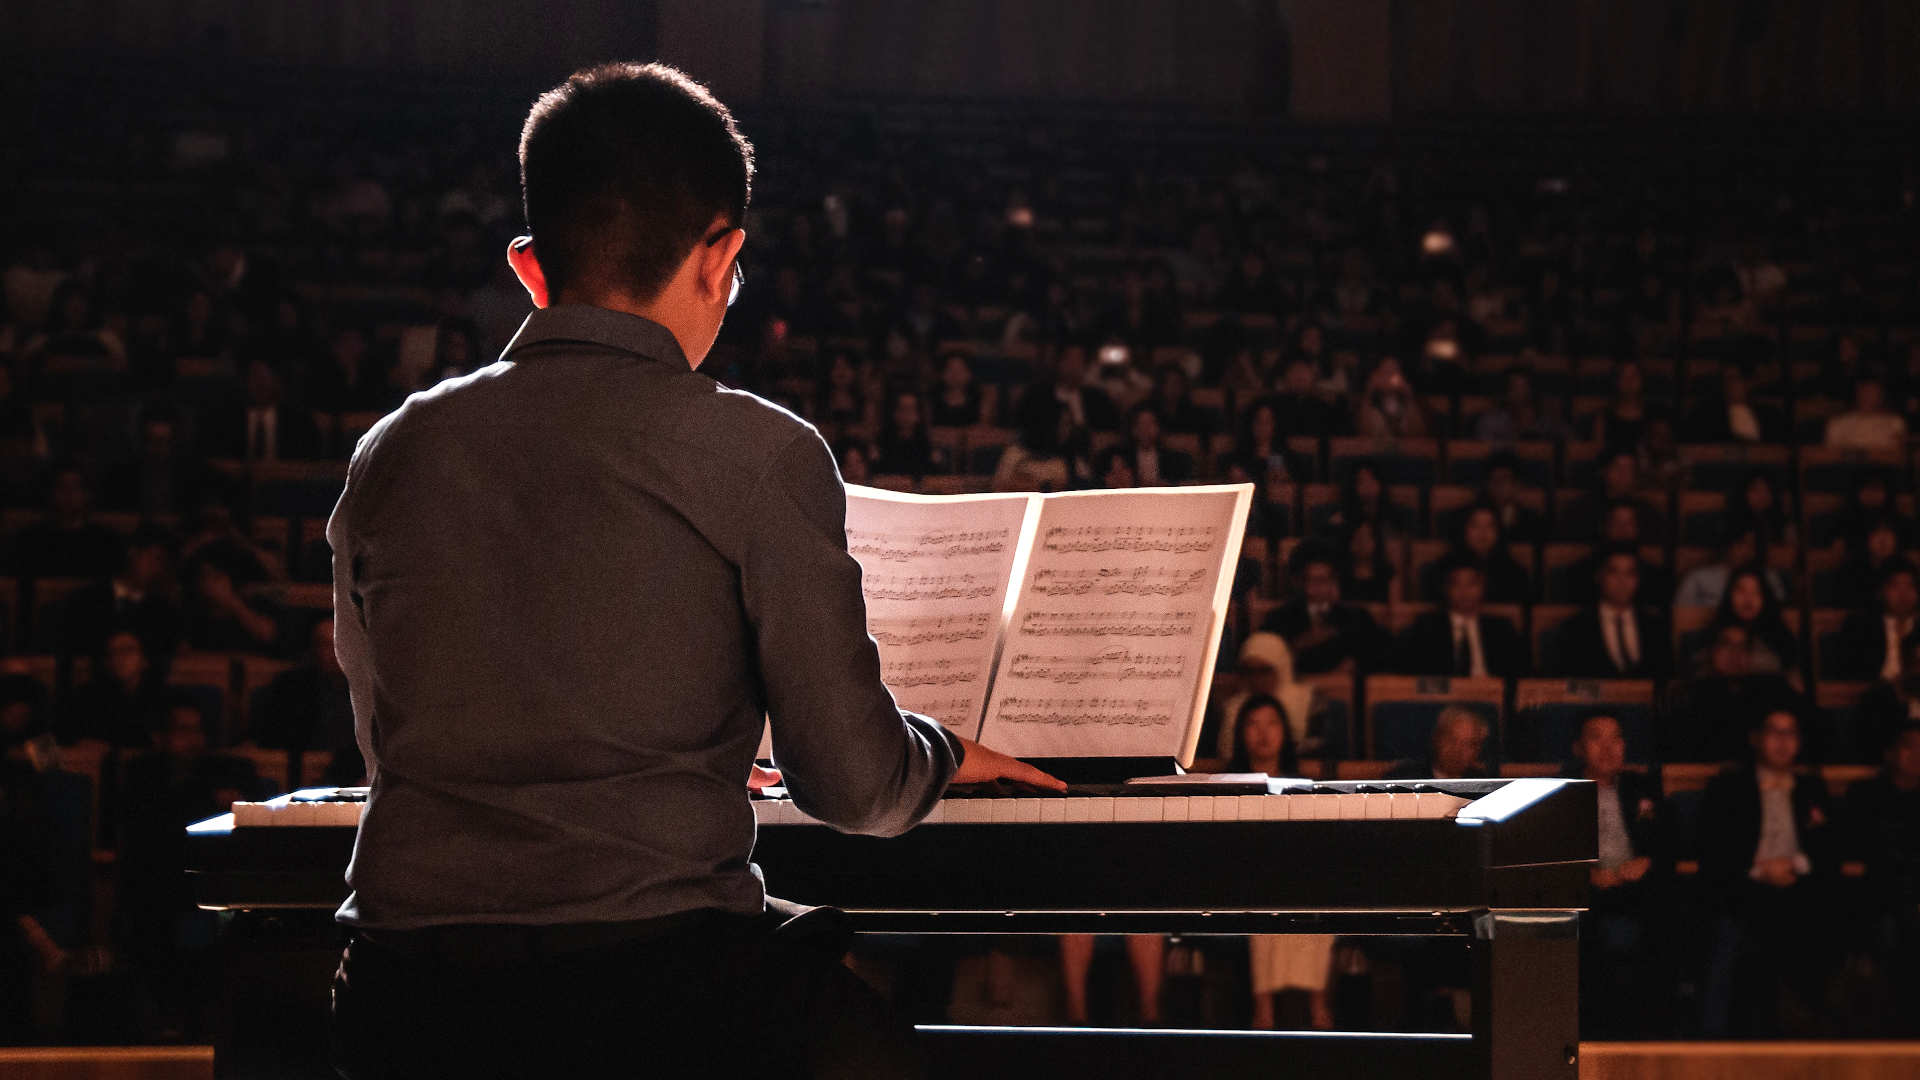 Music Performance Information